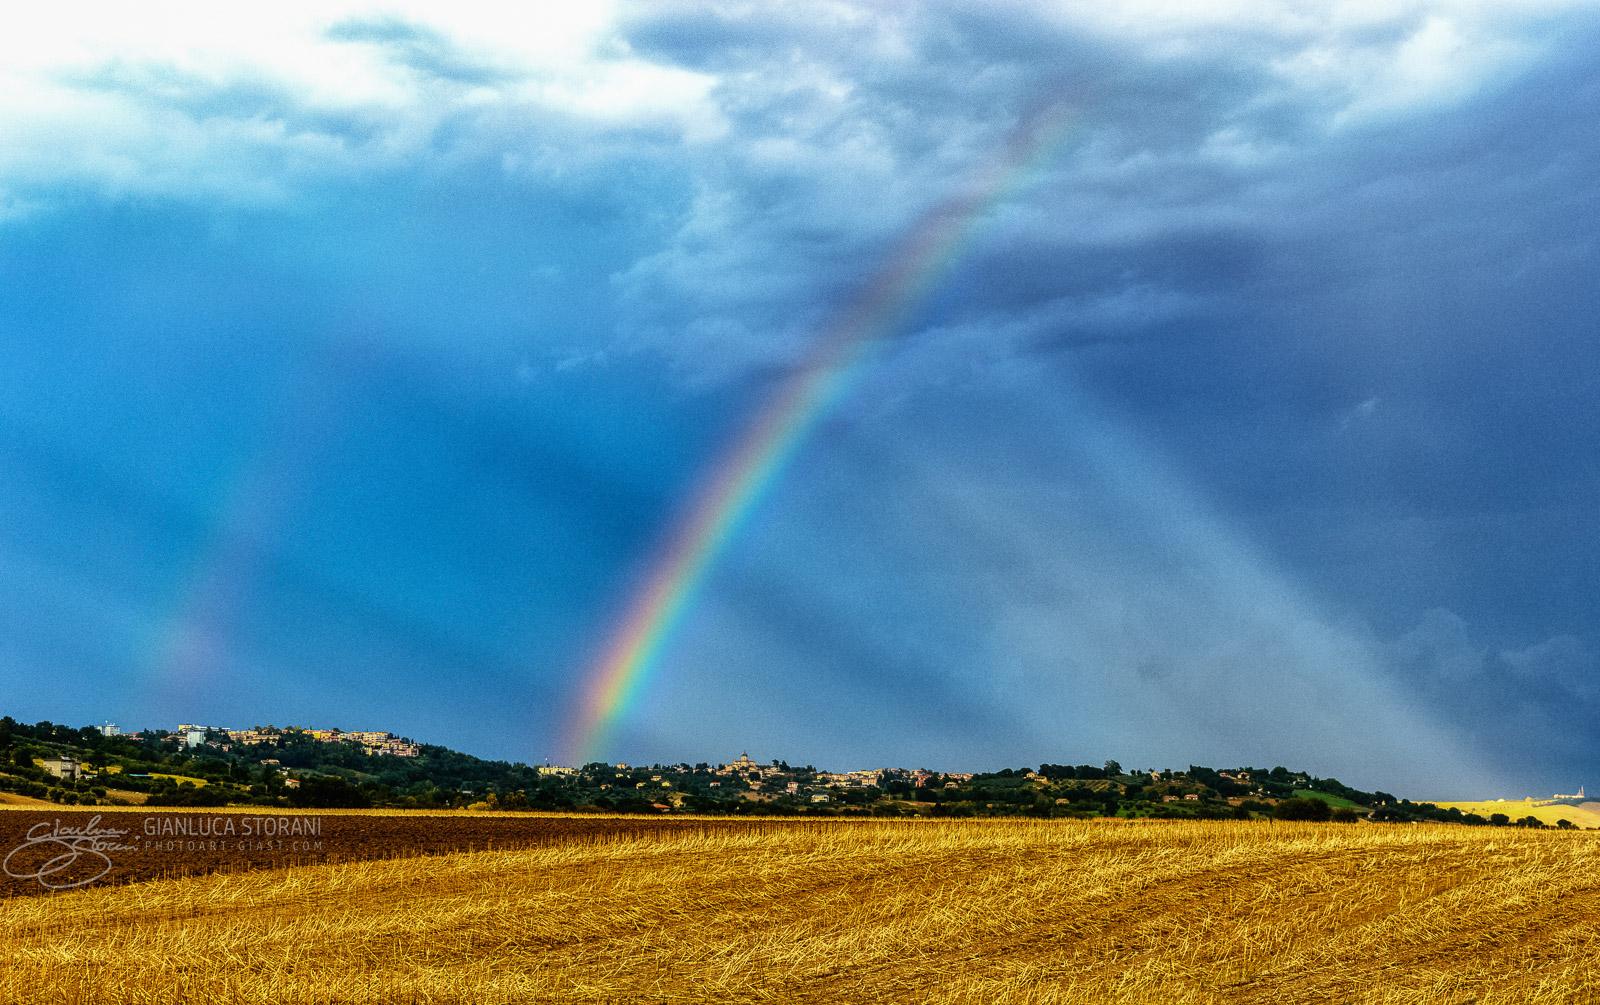 L'arcobaleno di raggi divini - Gianluca Storani Photo Art (ID: 4-3790)